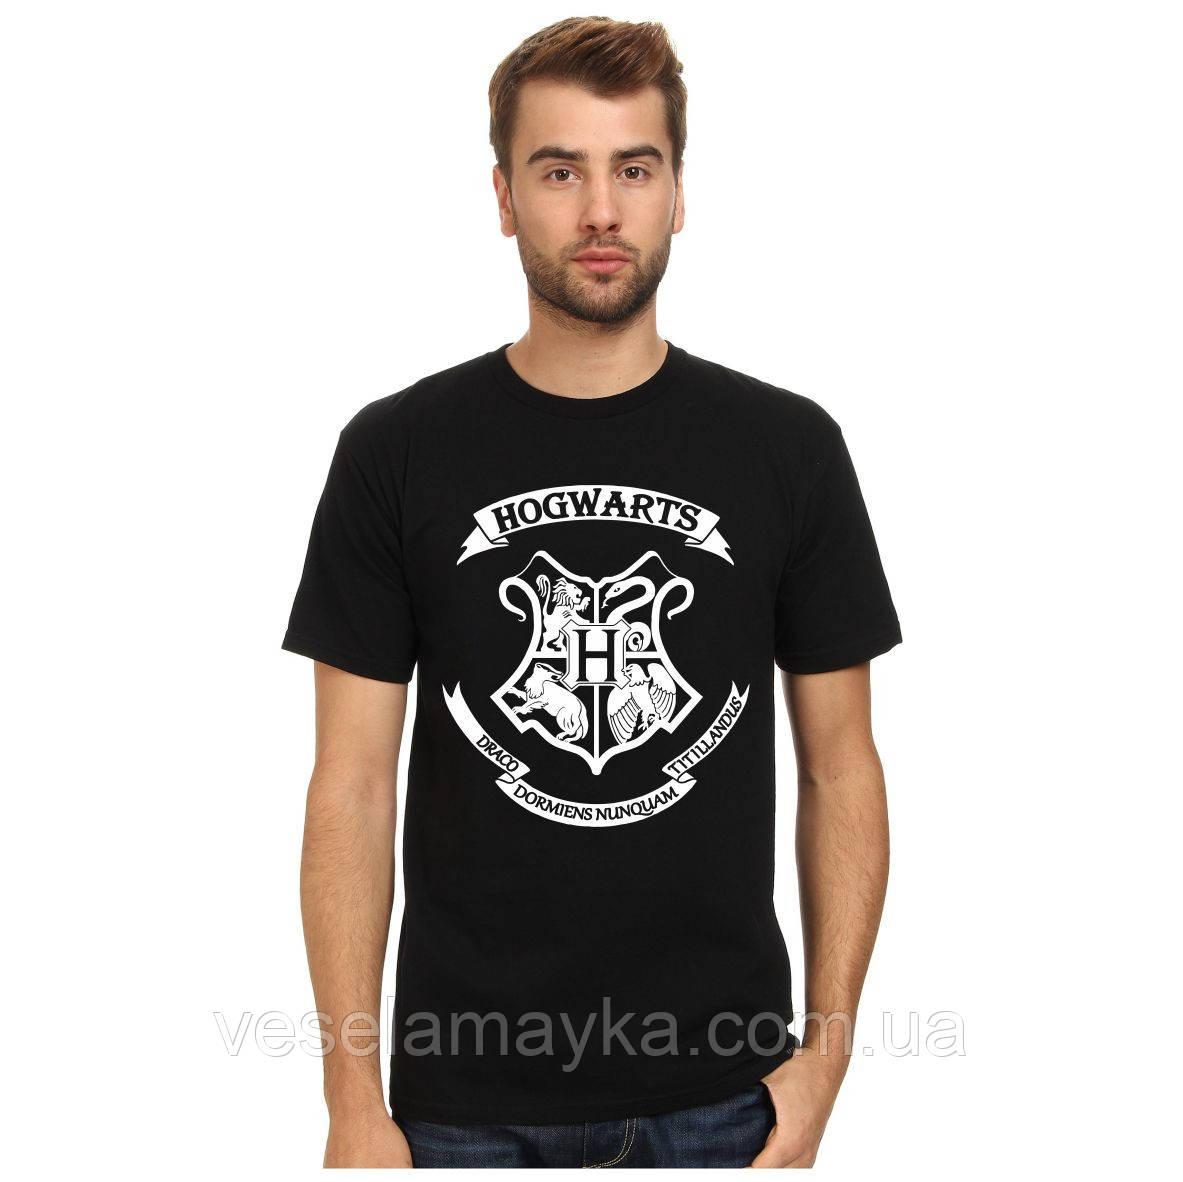 Купить Футболка Hogwarts (Хогвартс)